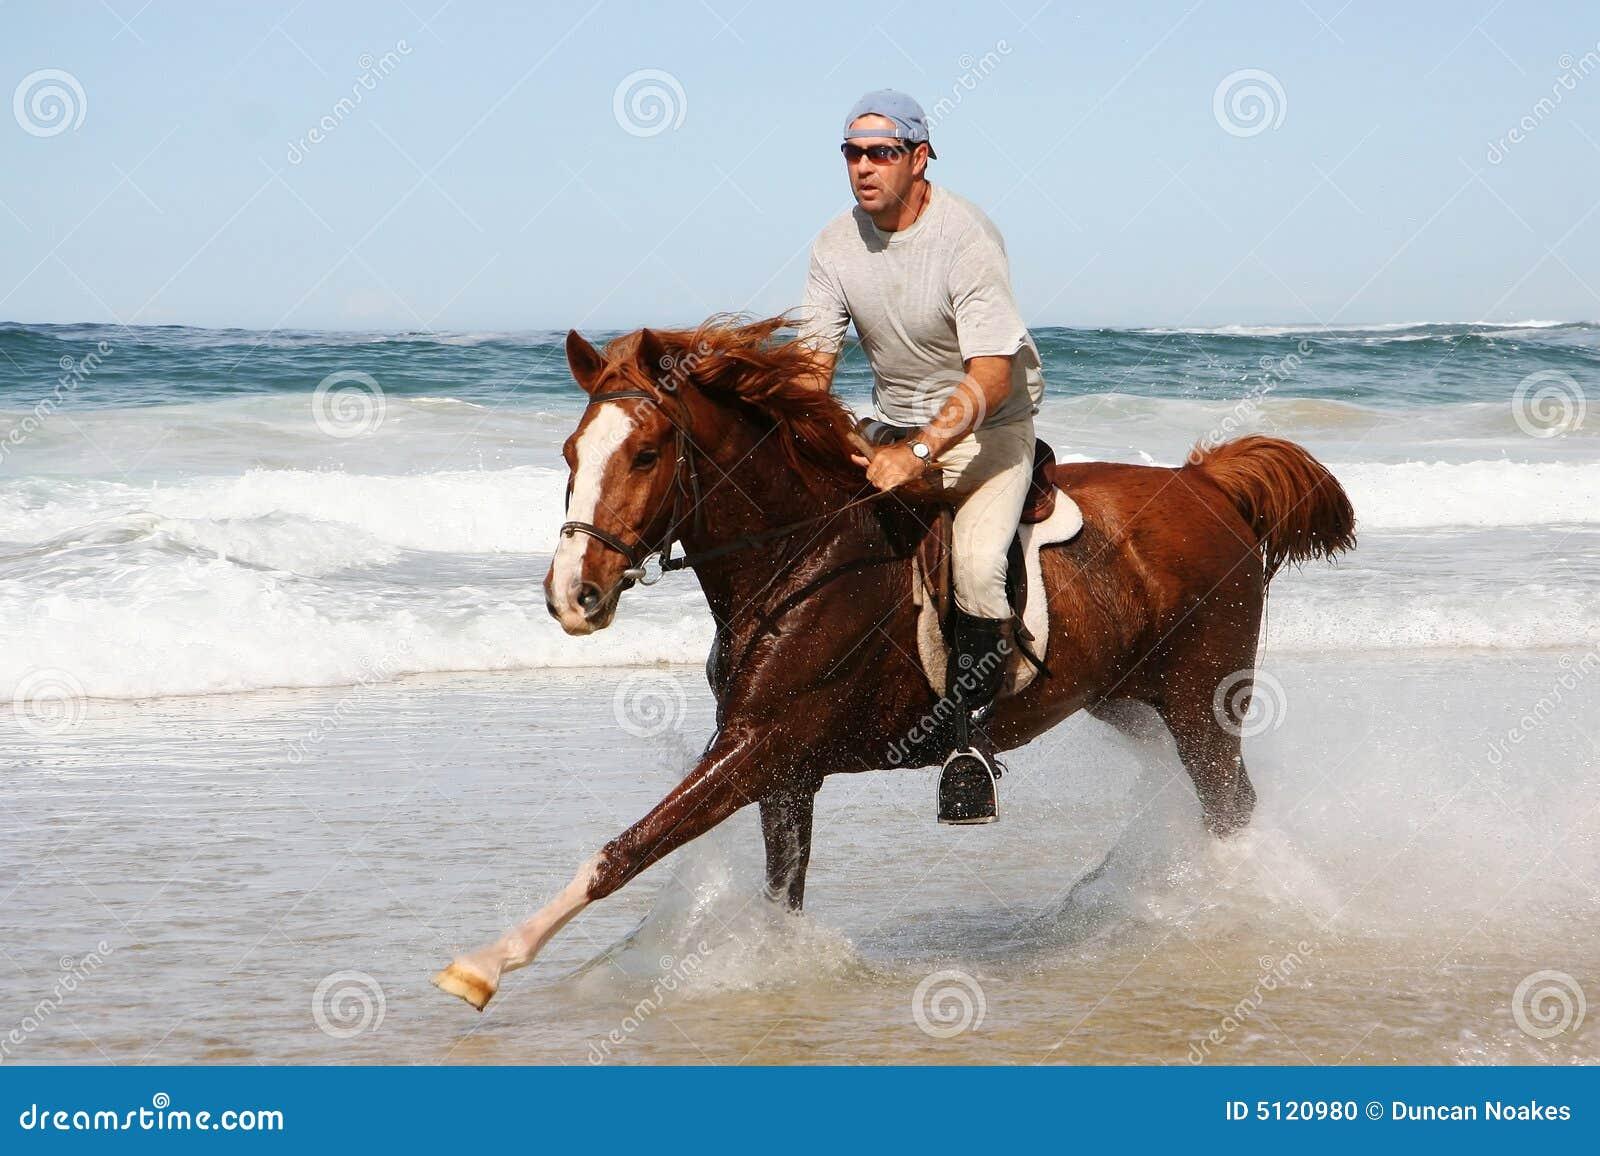 Running Horse at beach stock photo. Image of wild, racing ...